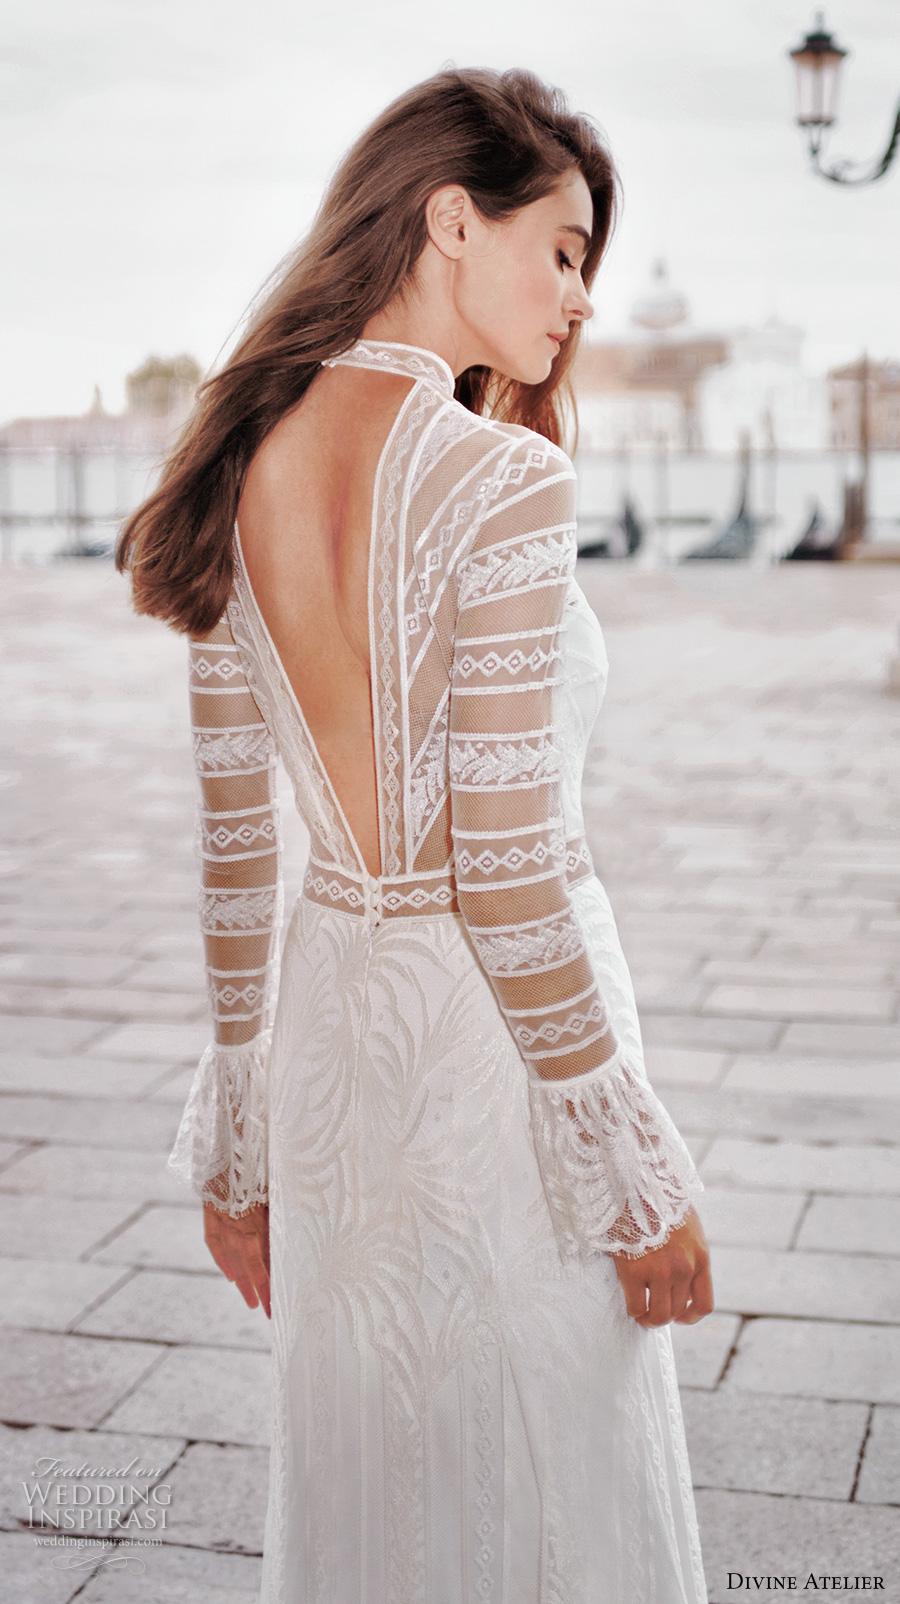 divine atelier 2017 bridal long sleeves illusion high neck sweetheart neckline lace embroidered elegant sheath wedding dress v back sweep train (unnamed01) zbv